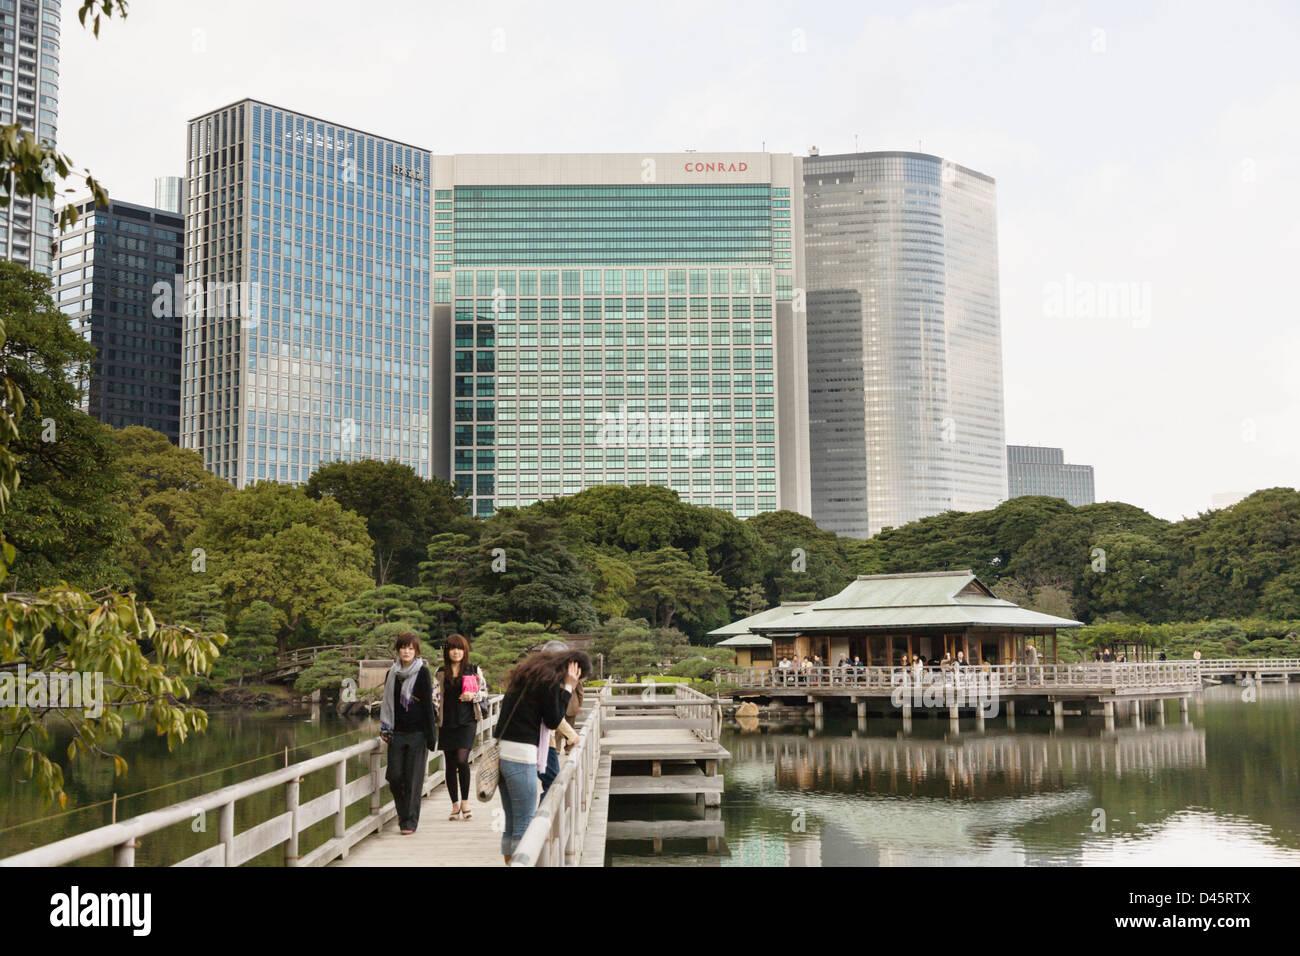 Skyscrapers of Shiodome tower over Nakajima no ochaya teahouse at Hamarikyu Detached Garden, Tokyo, Japan - Stock Image